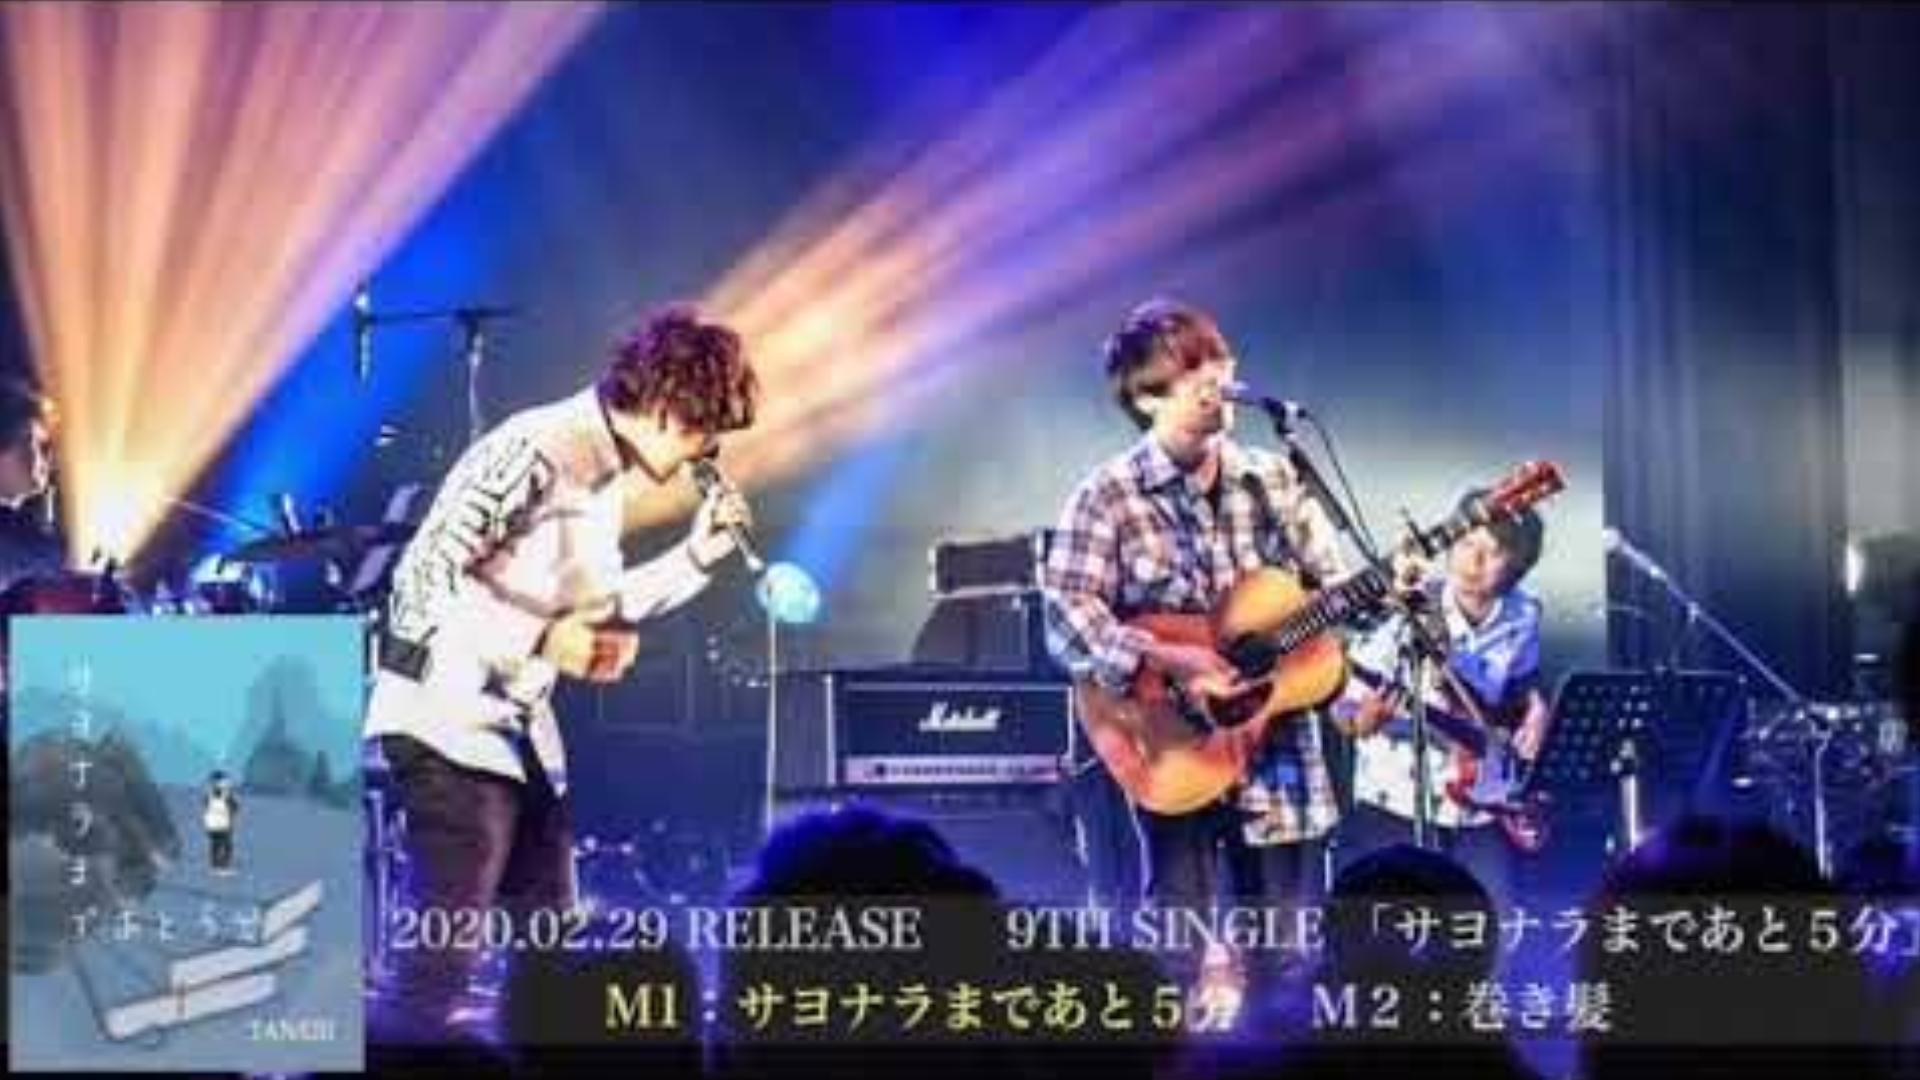 TANEBI 9th SINGLE『サヨナラまであと5分』 フル期間限定公開!